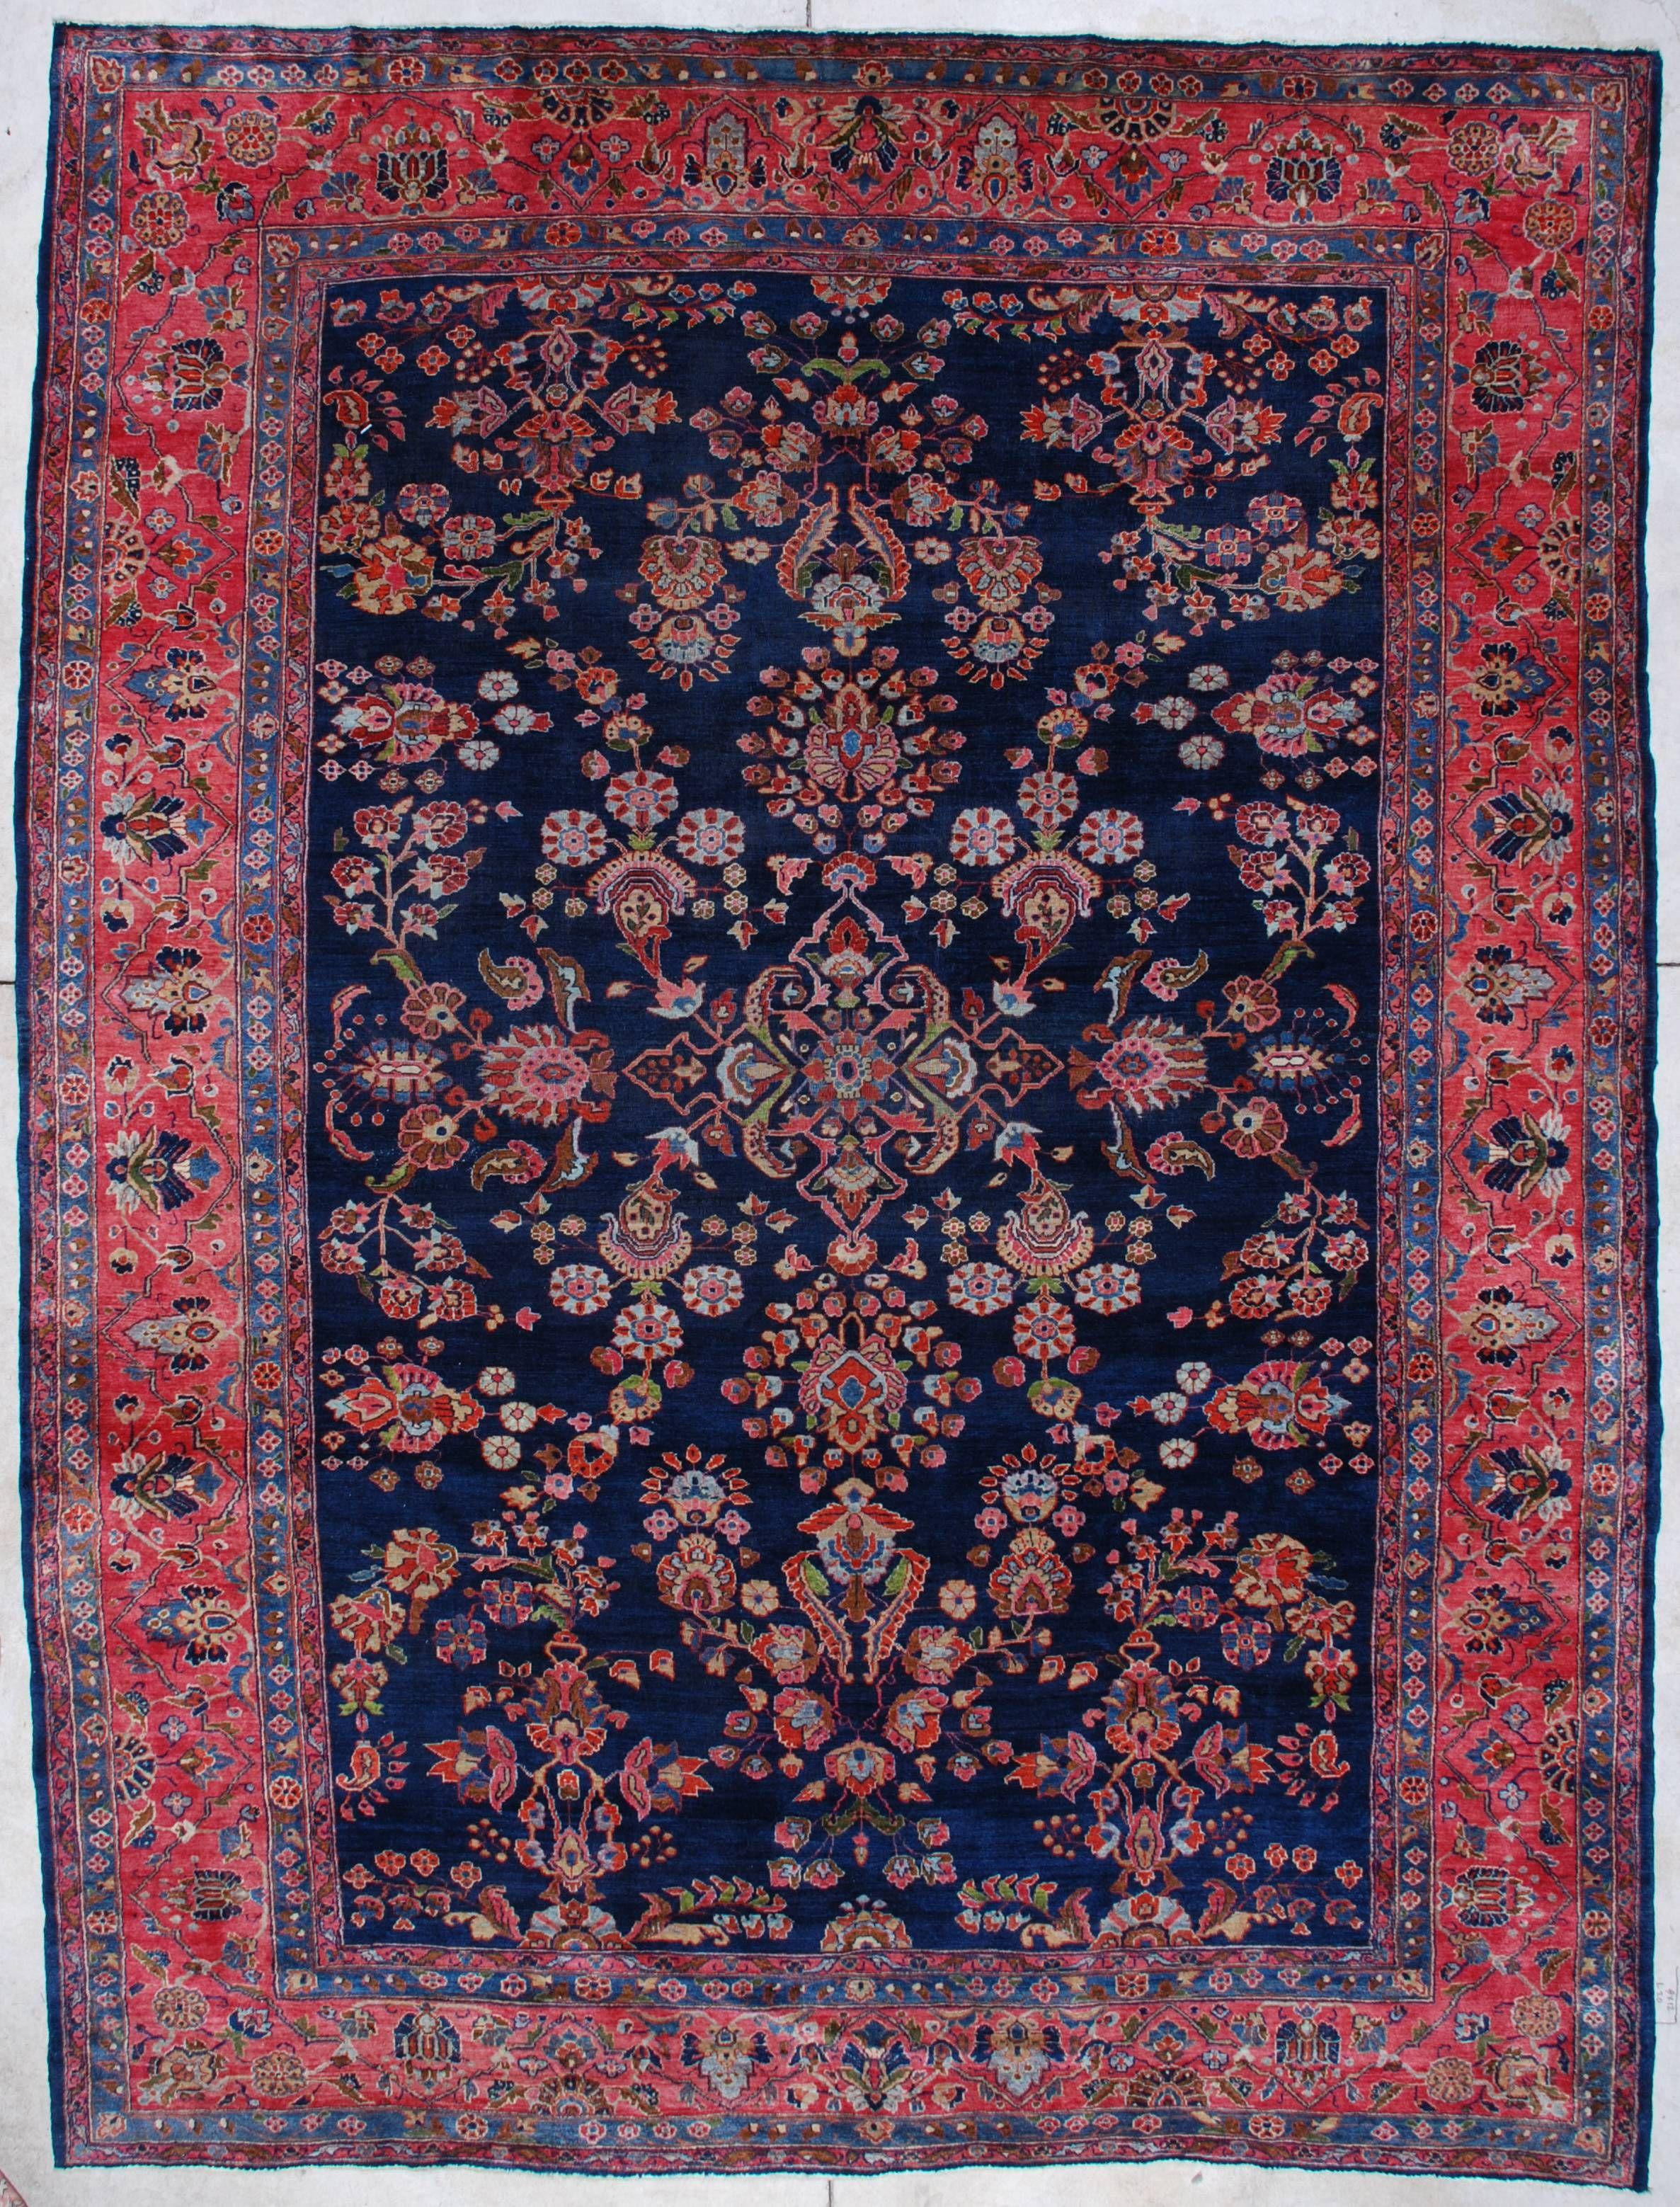 7050 Mahajaran Sarouk Antique Persian Rug 9 1 X 11 10 Persian Rug Rugs Oriental Rug